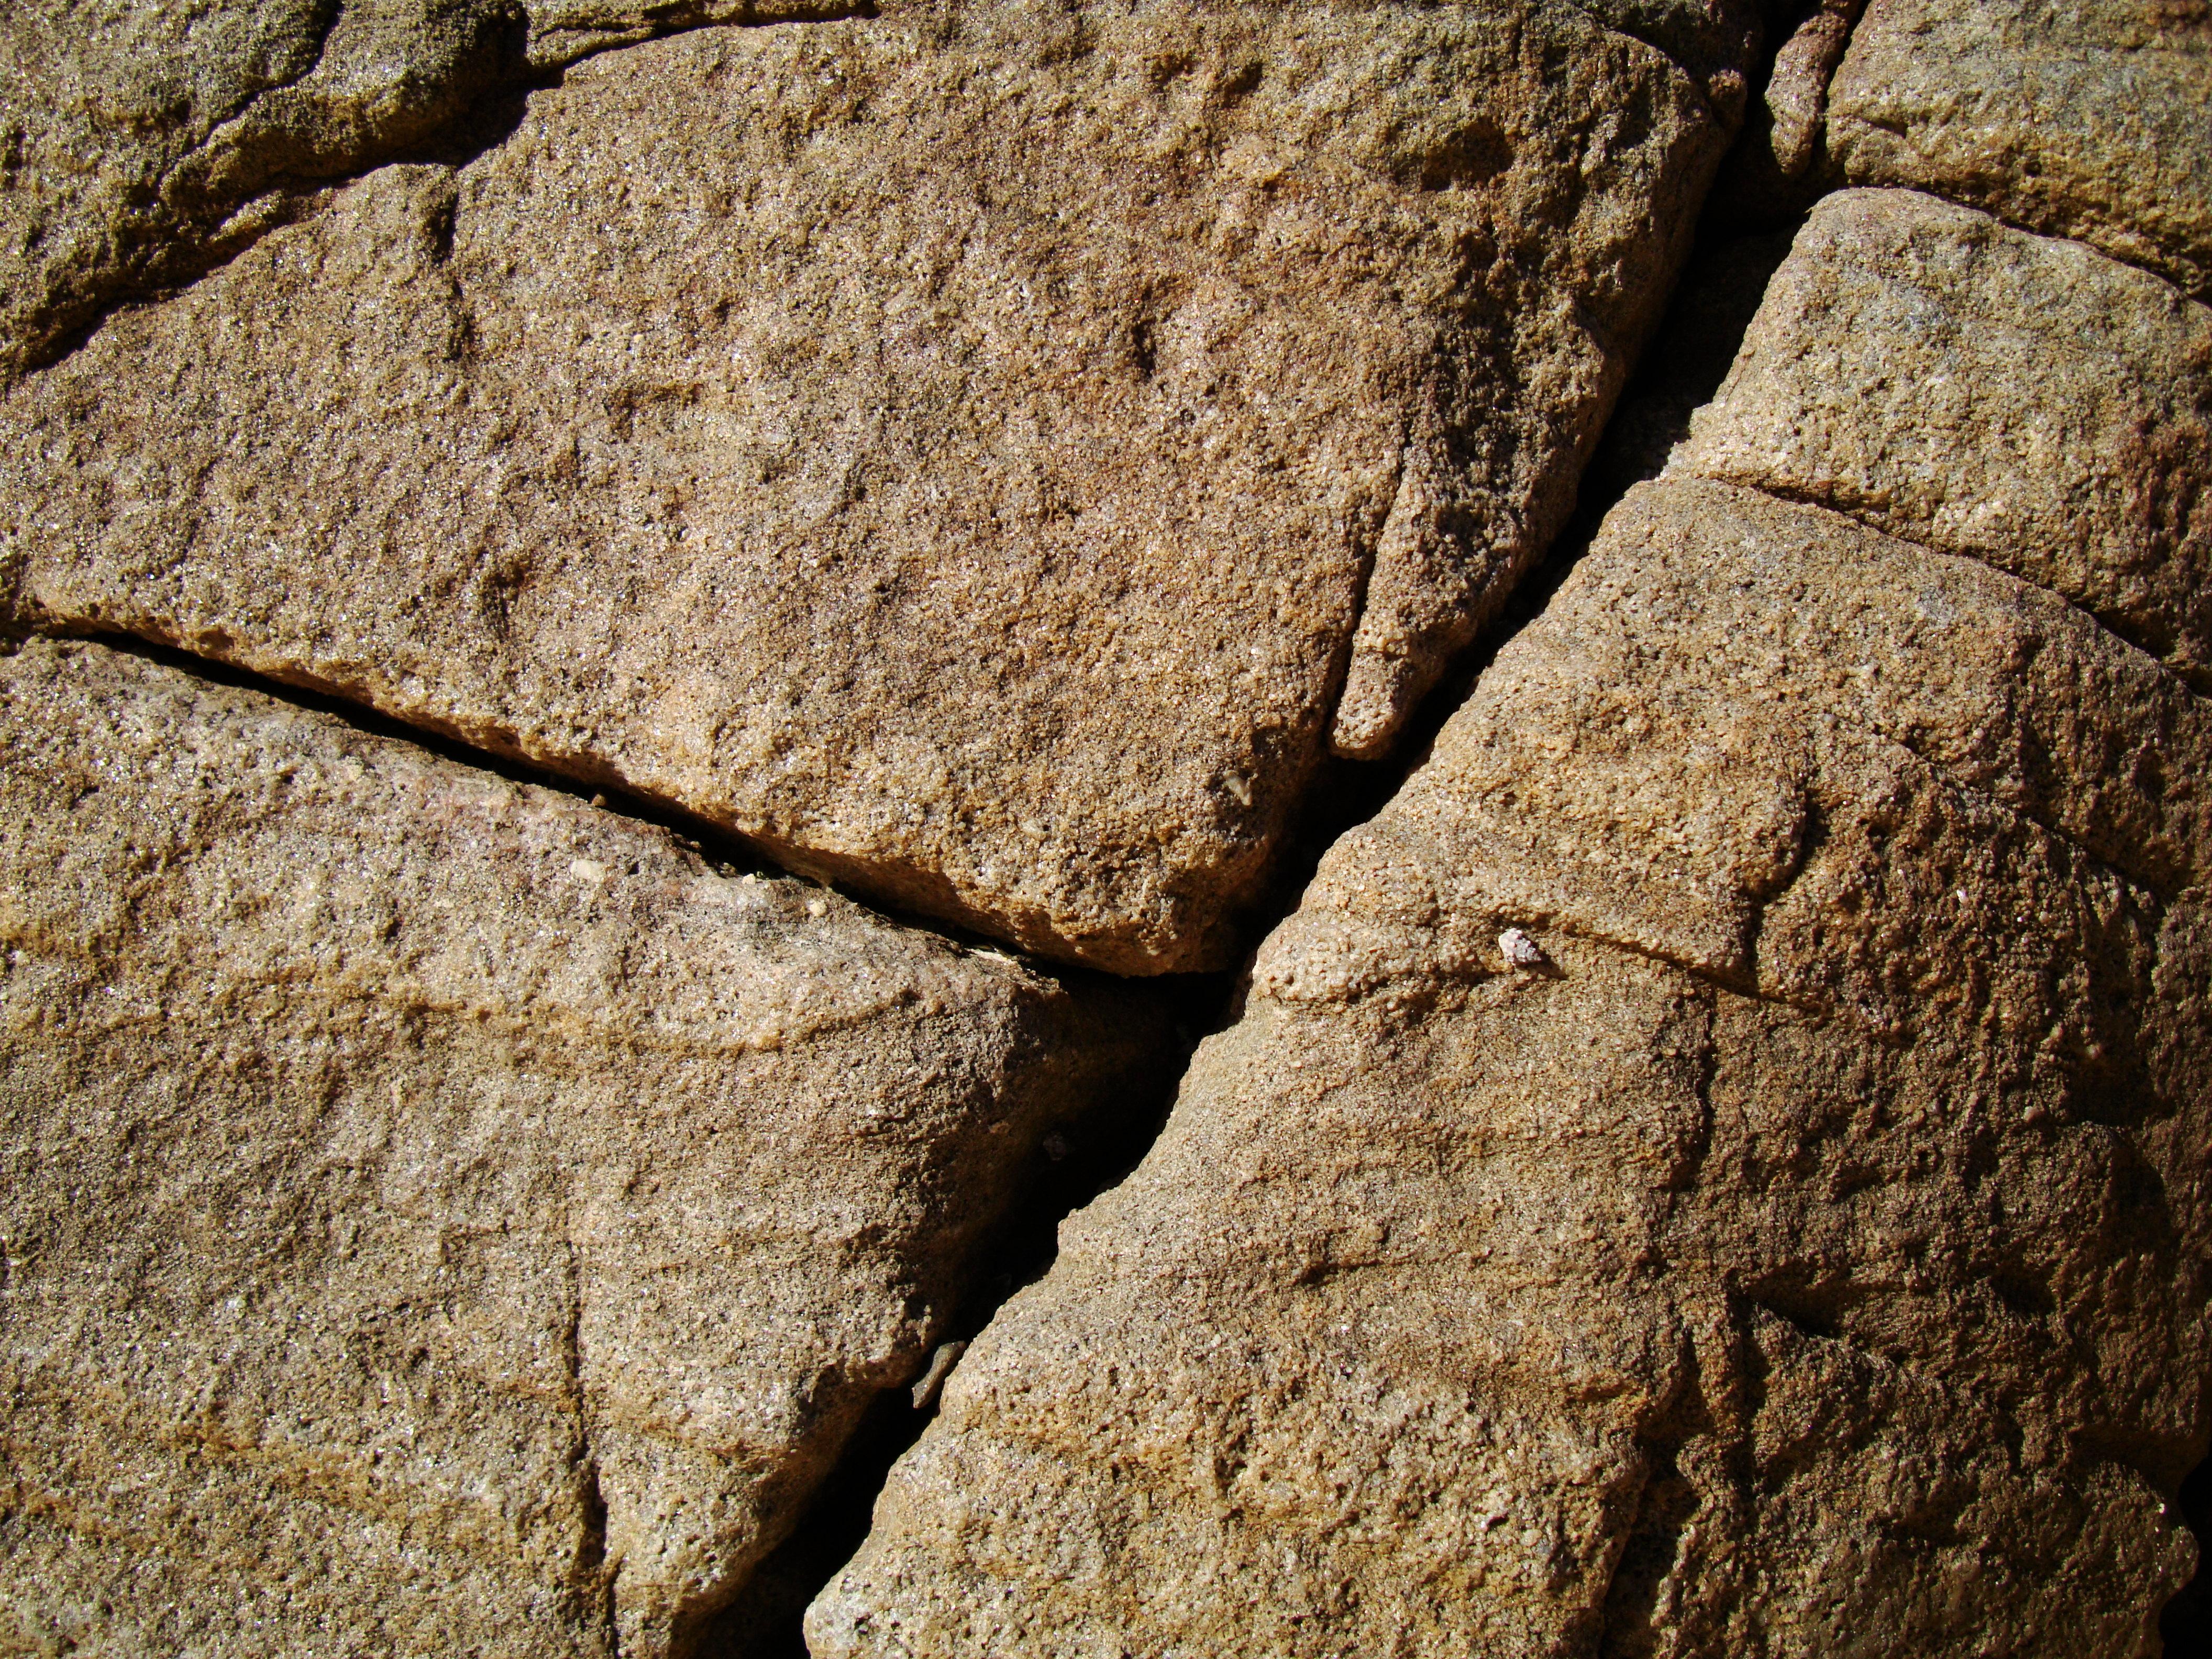 Textures Rocks Stones Pebbles Noosa National Park 08